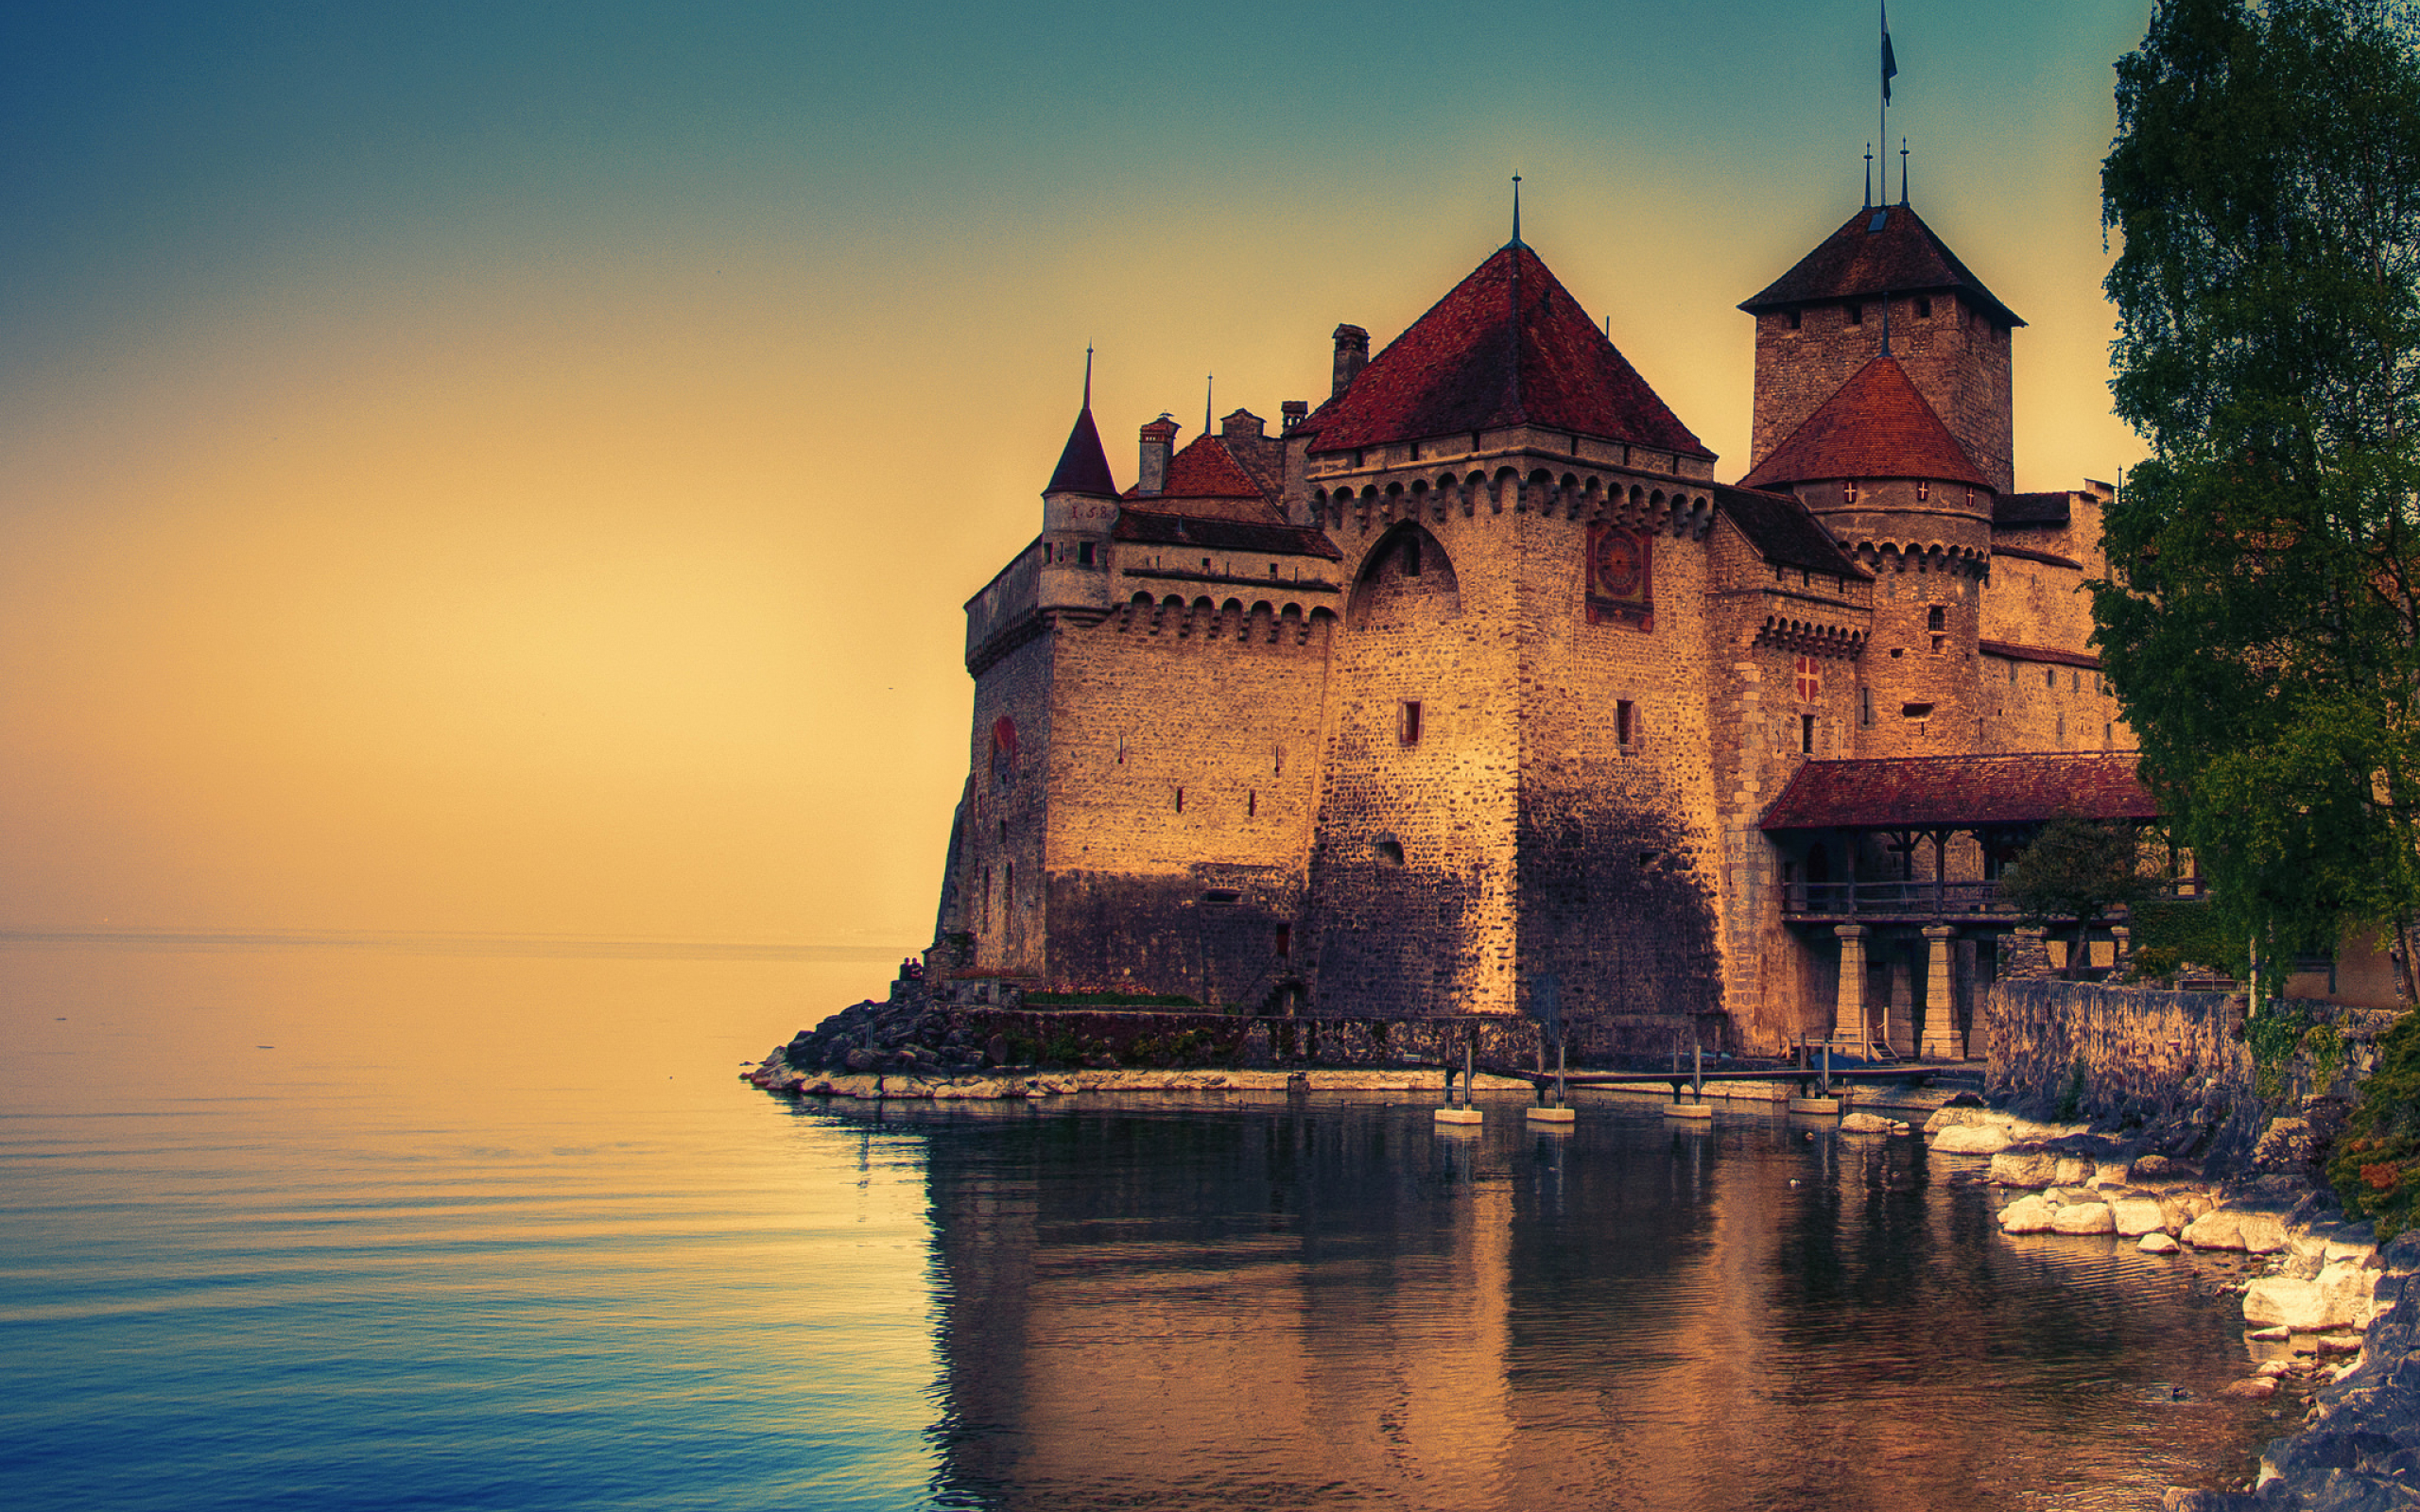 Chillon castle switzerland lake geneva full hd 2k wallpaper - Switzerland wallpaper full hd ...